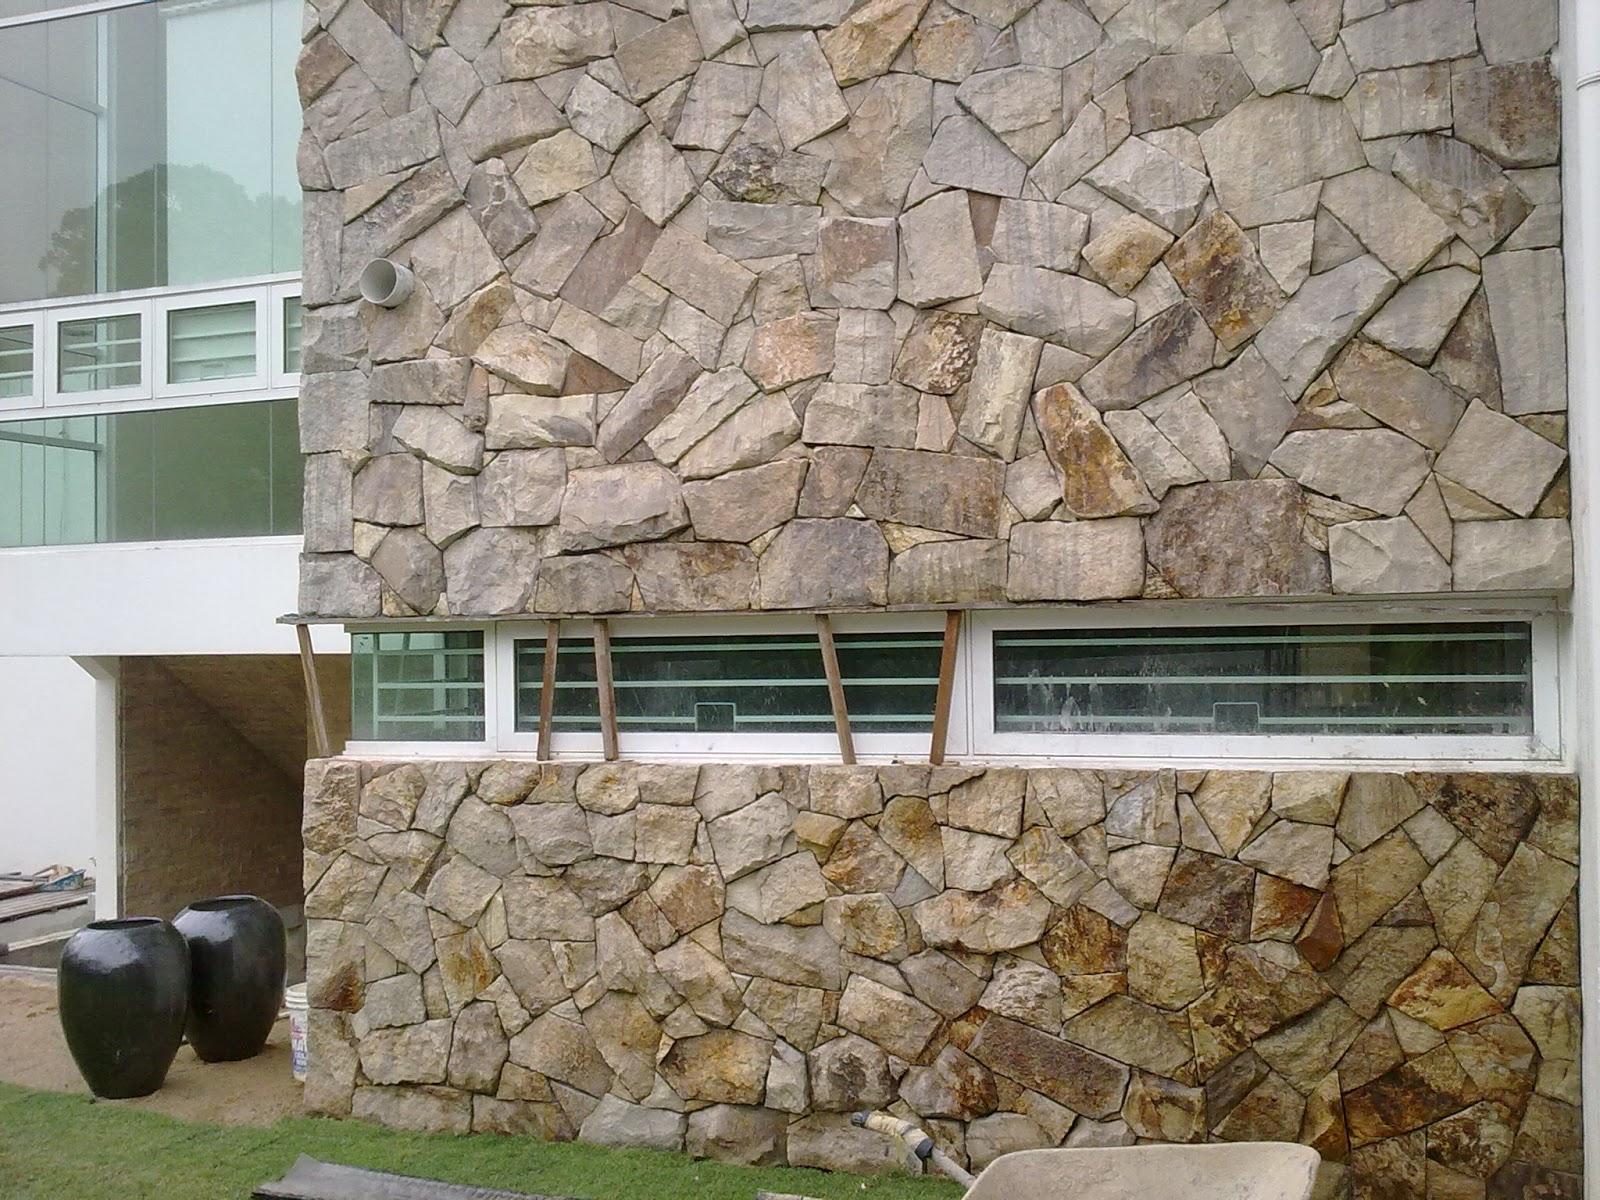 Gerbang utara resources kedai tile sungai buloh sesi - Exterior stone paint model ...